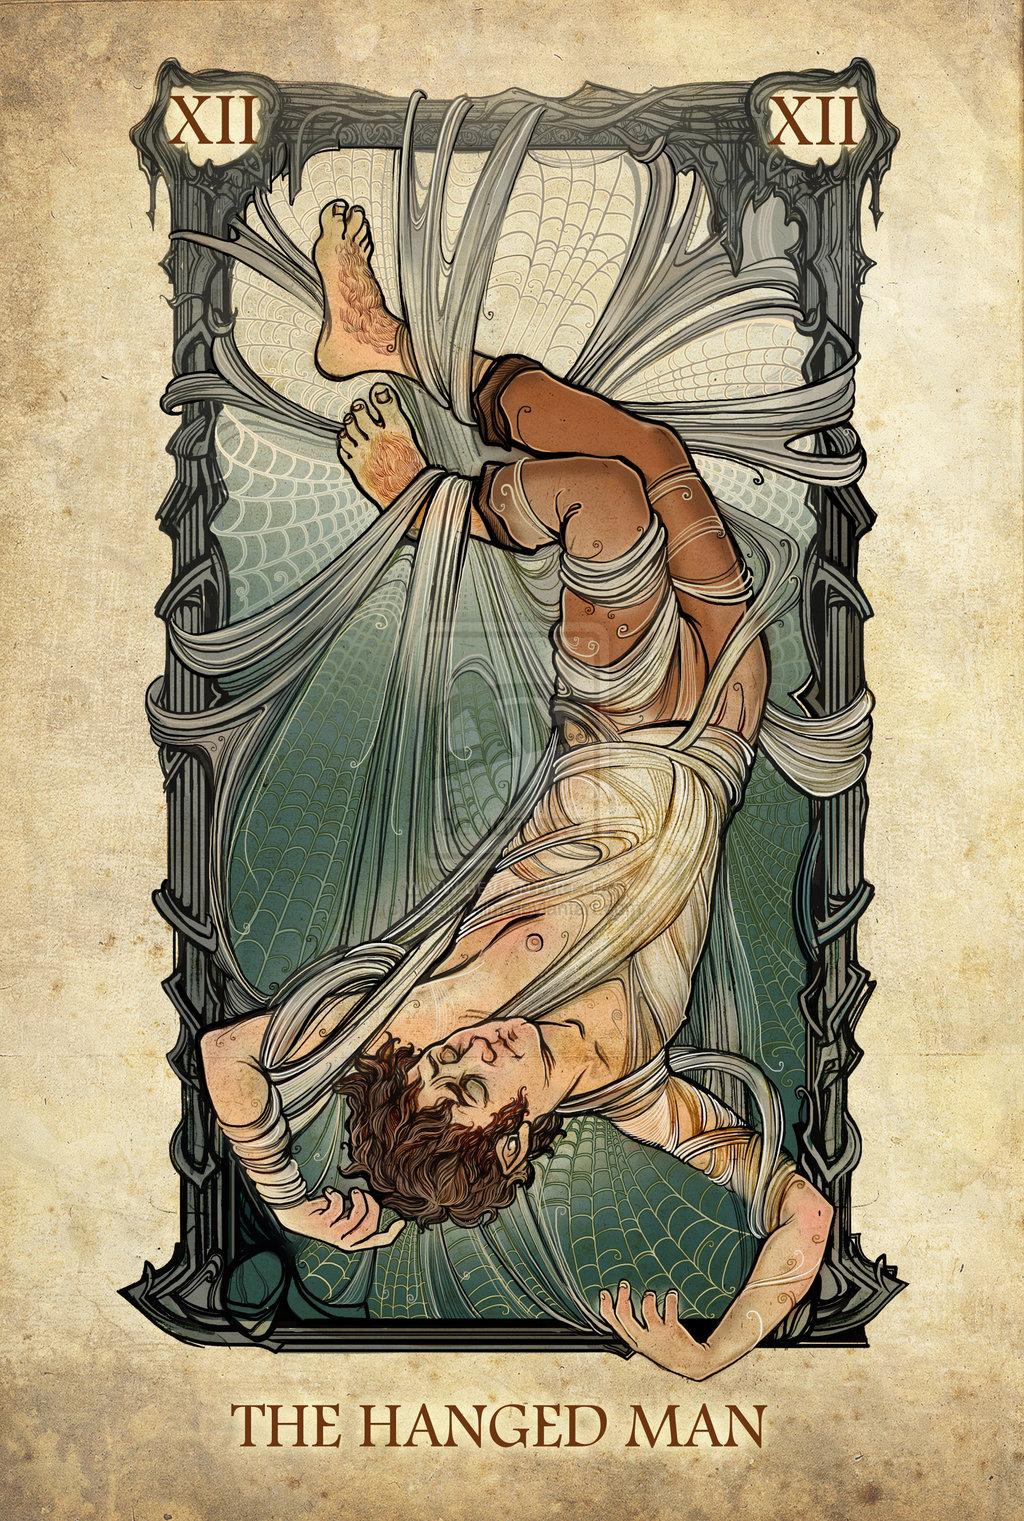 tarot__the_hanged_man_by_sceithailm-d6c8e9s